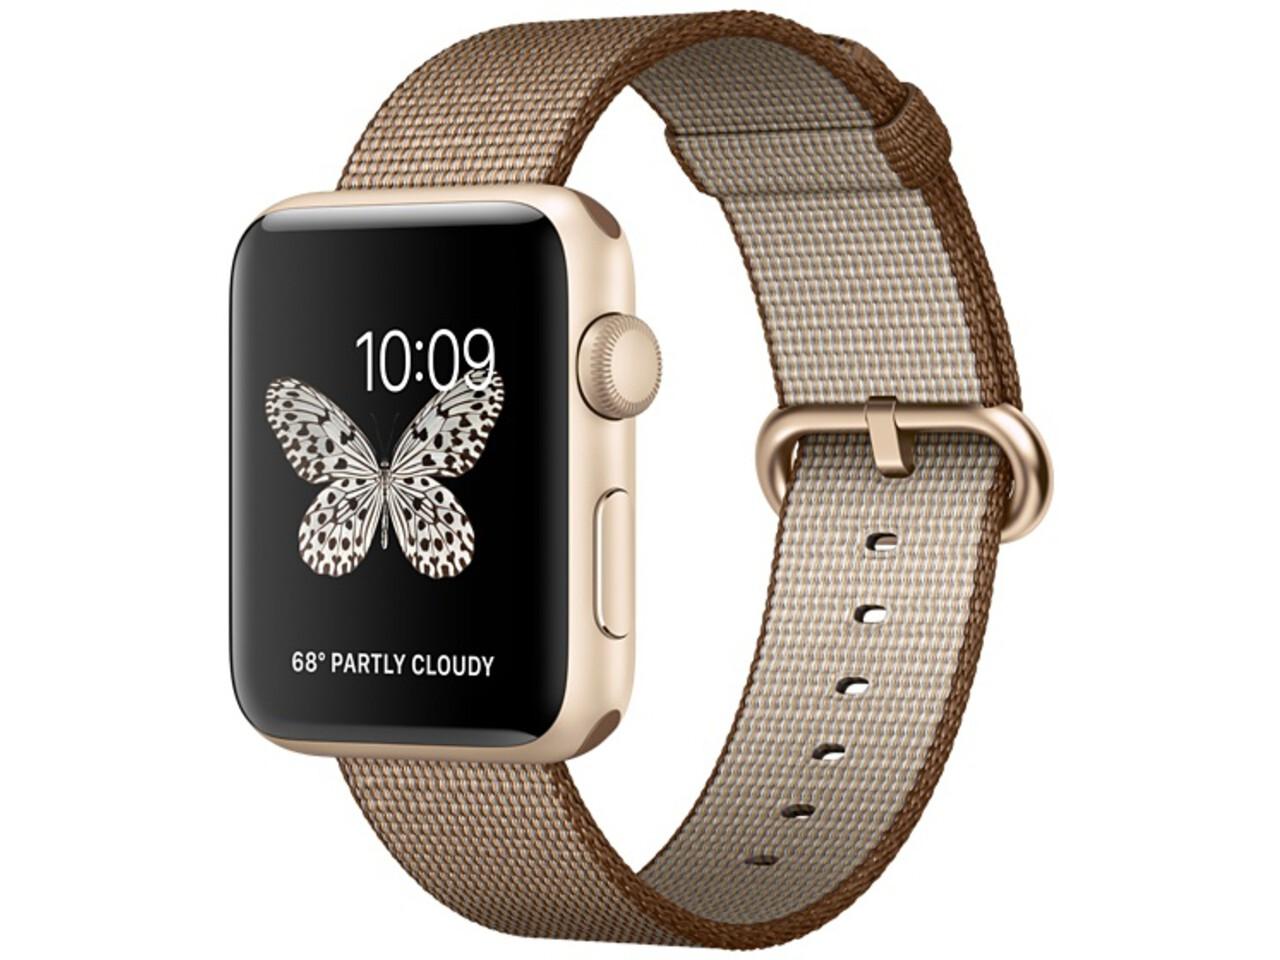 apple watch series 2 42mm gold aluminum toasted coffeecaramel woven nylon band